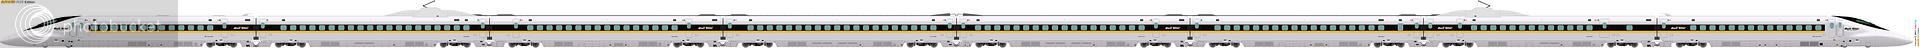 High-Speed Train 2246